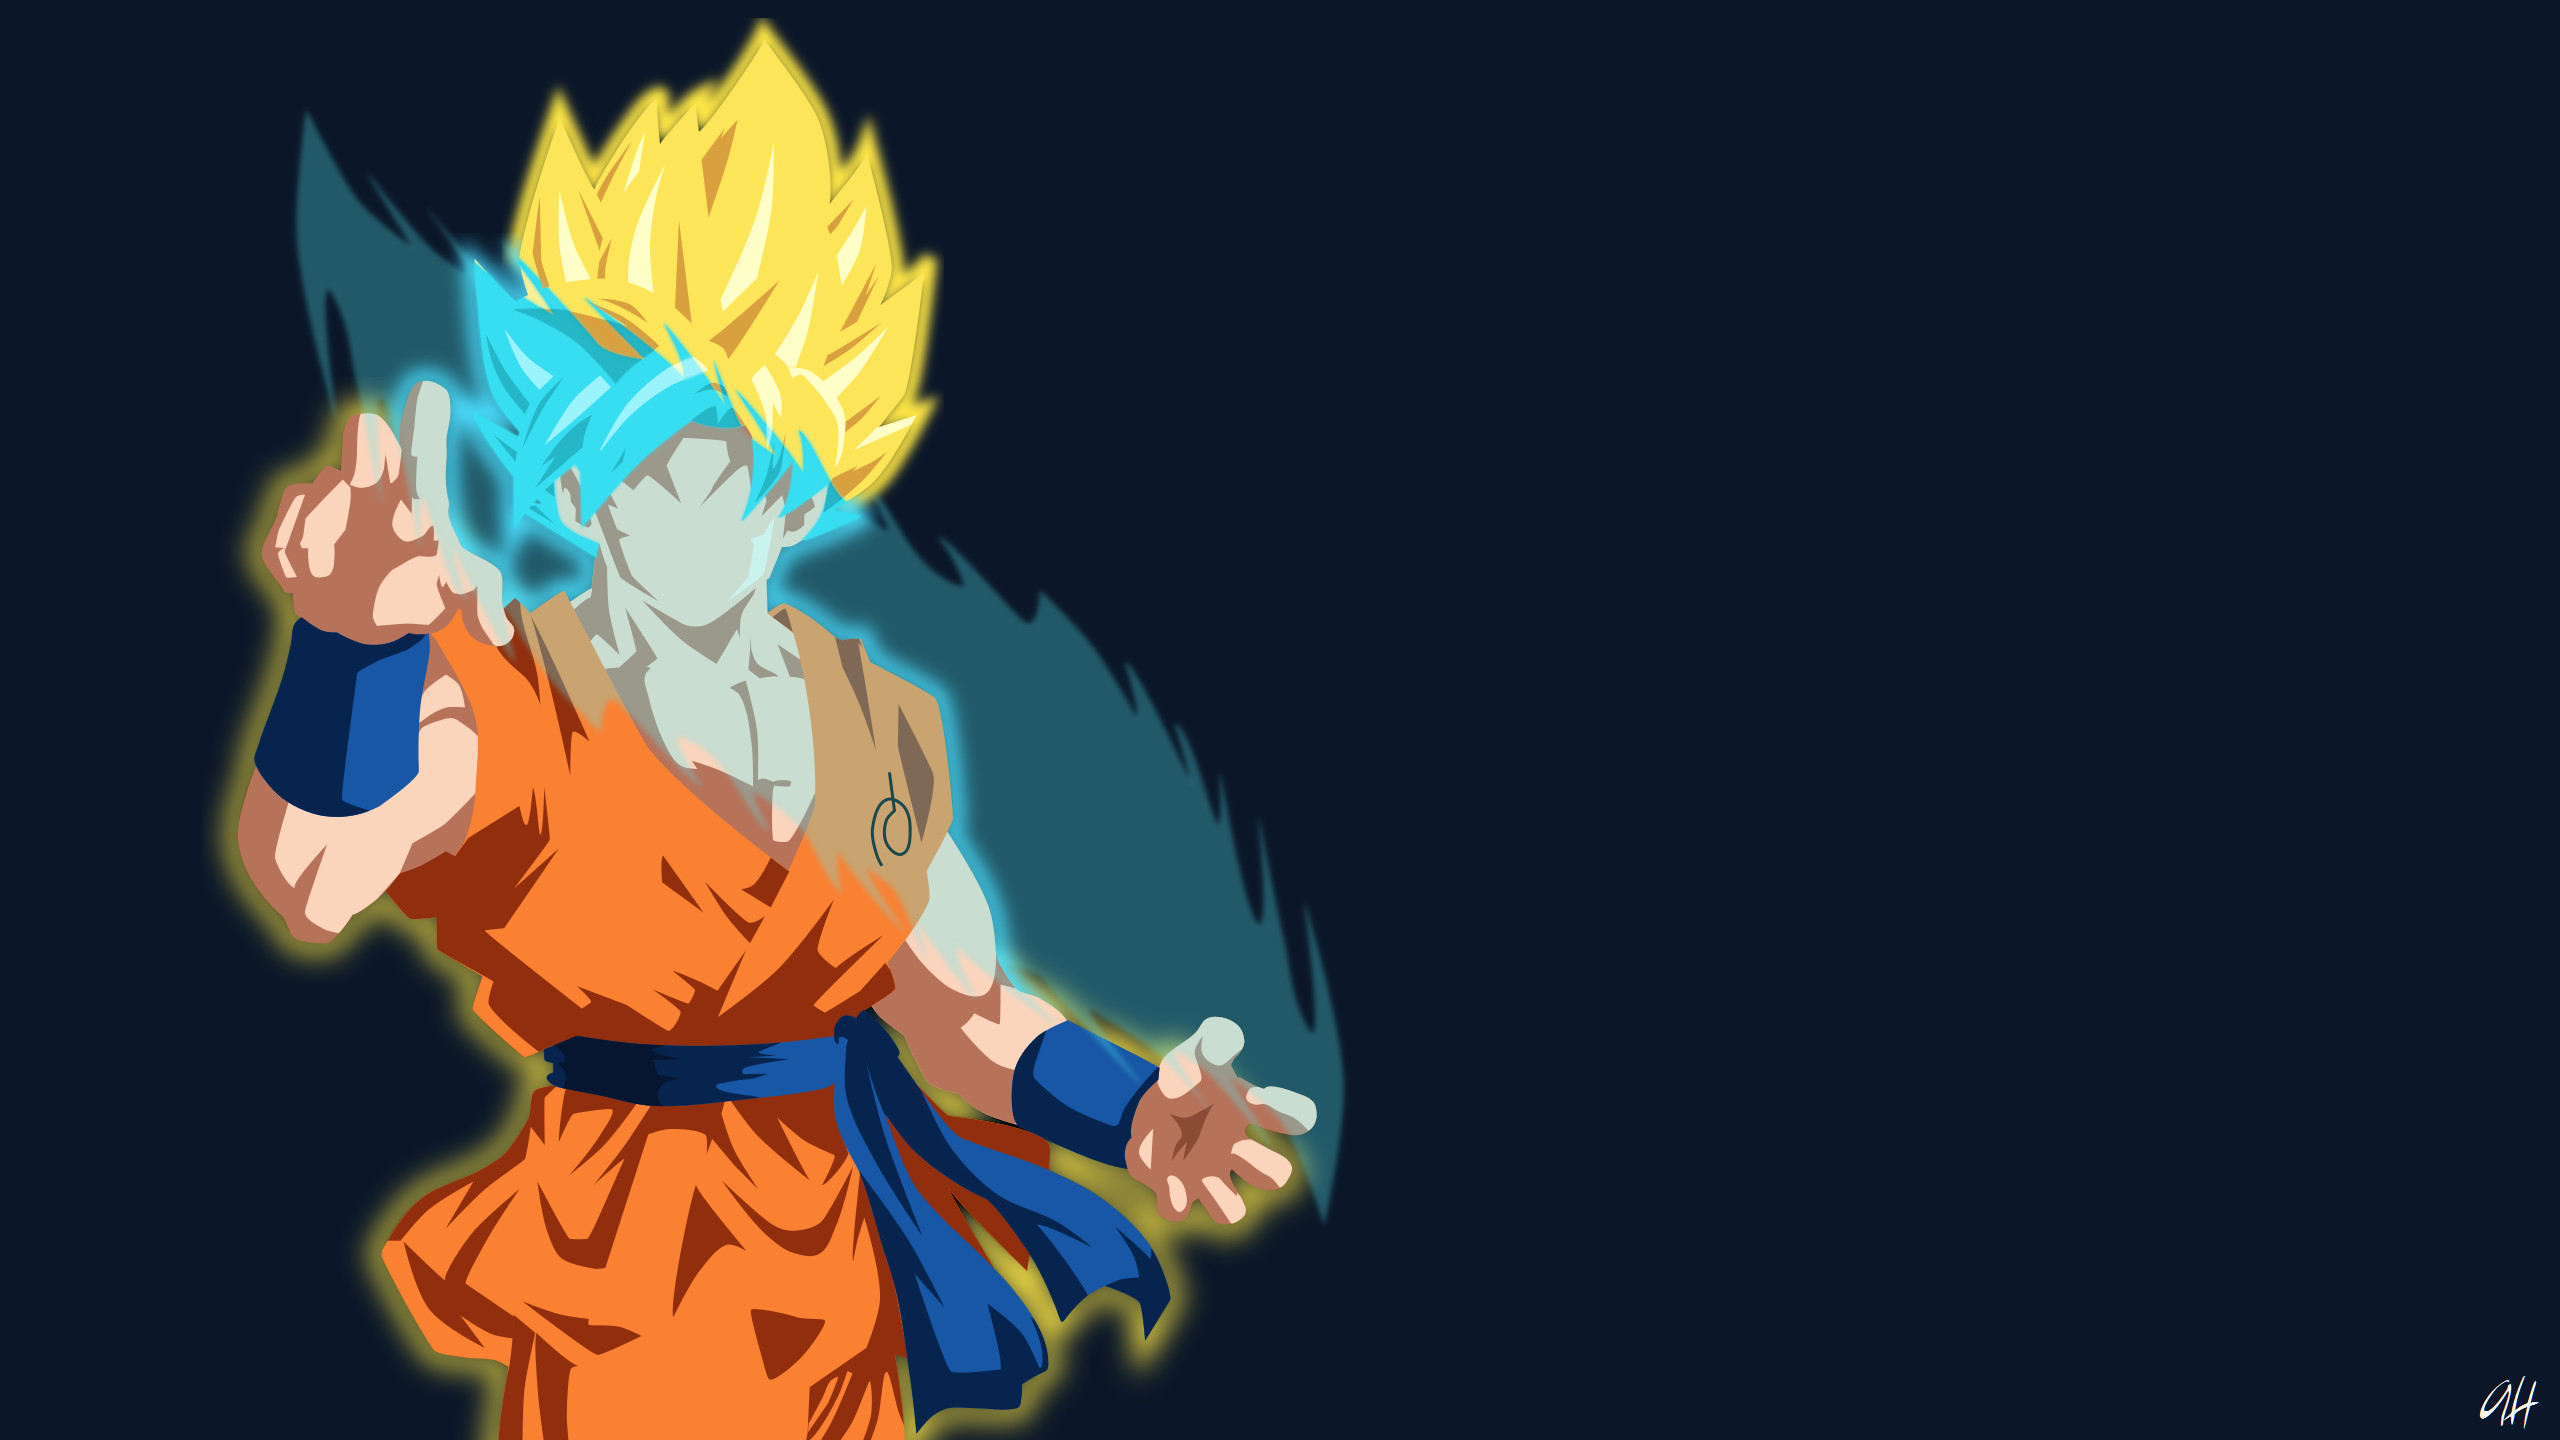 1920x1080 Goten Gohan And Goku Fire The Family Kamehameha Against Broly Download Dragon Ball Z Super Saiyan 1000 Wallpaper